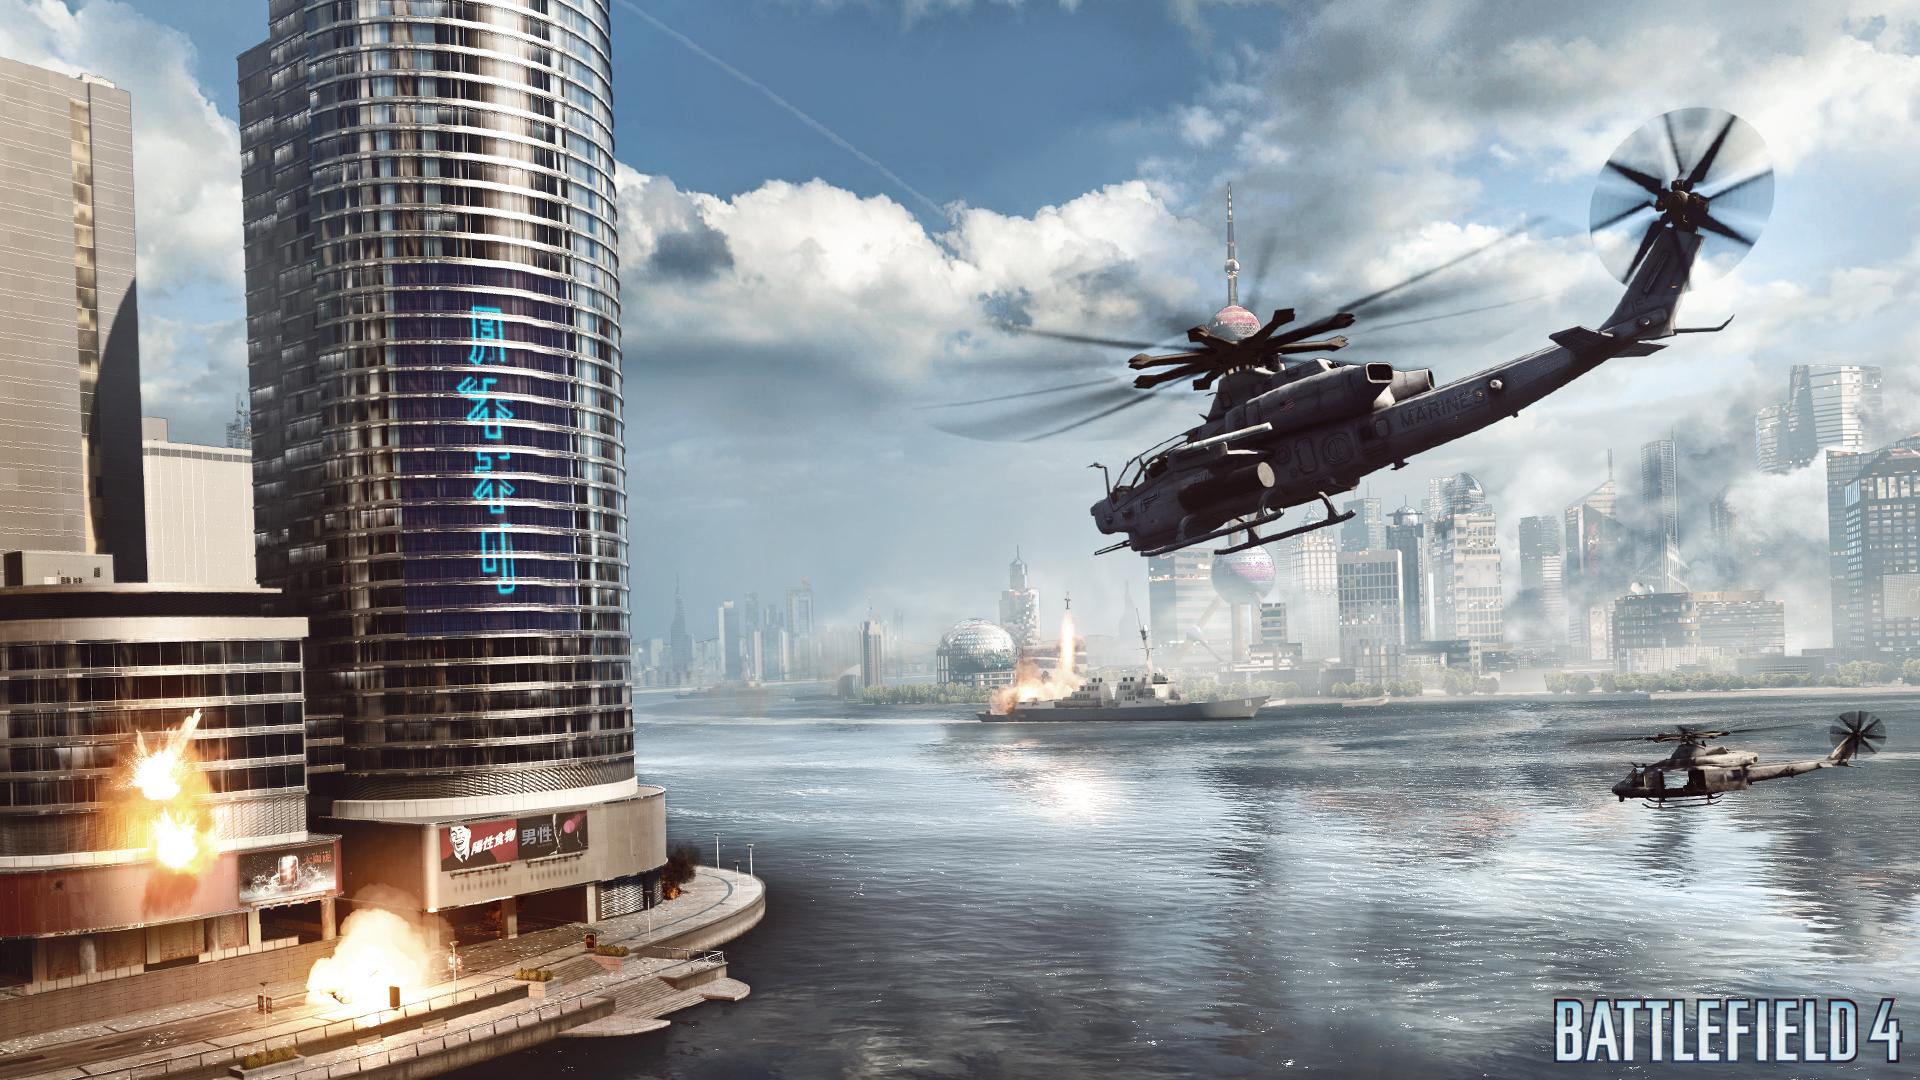 25  best ideas about <b>Battlefield 4</b> on Pinterest | Battlefeild 4 ...